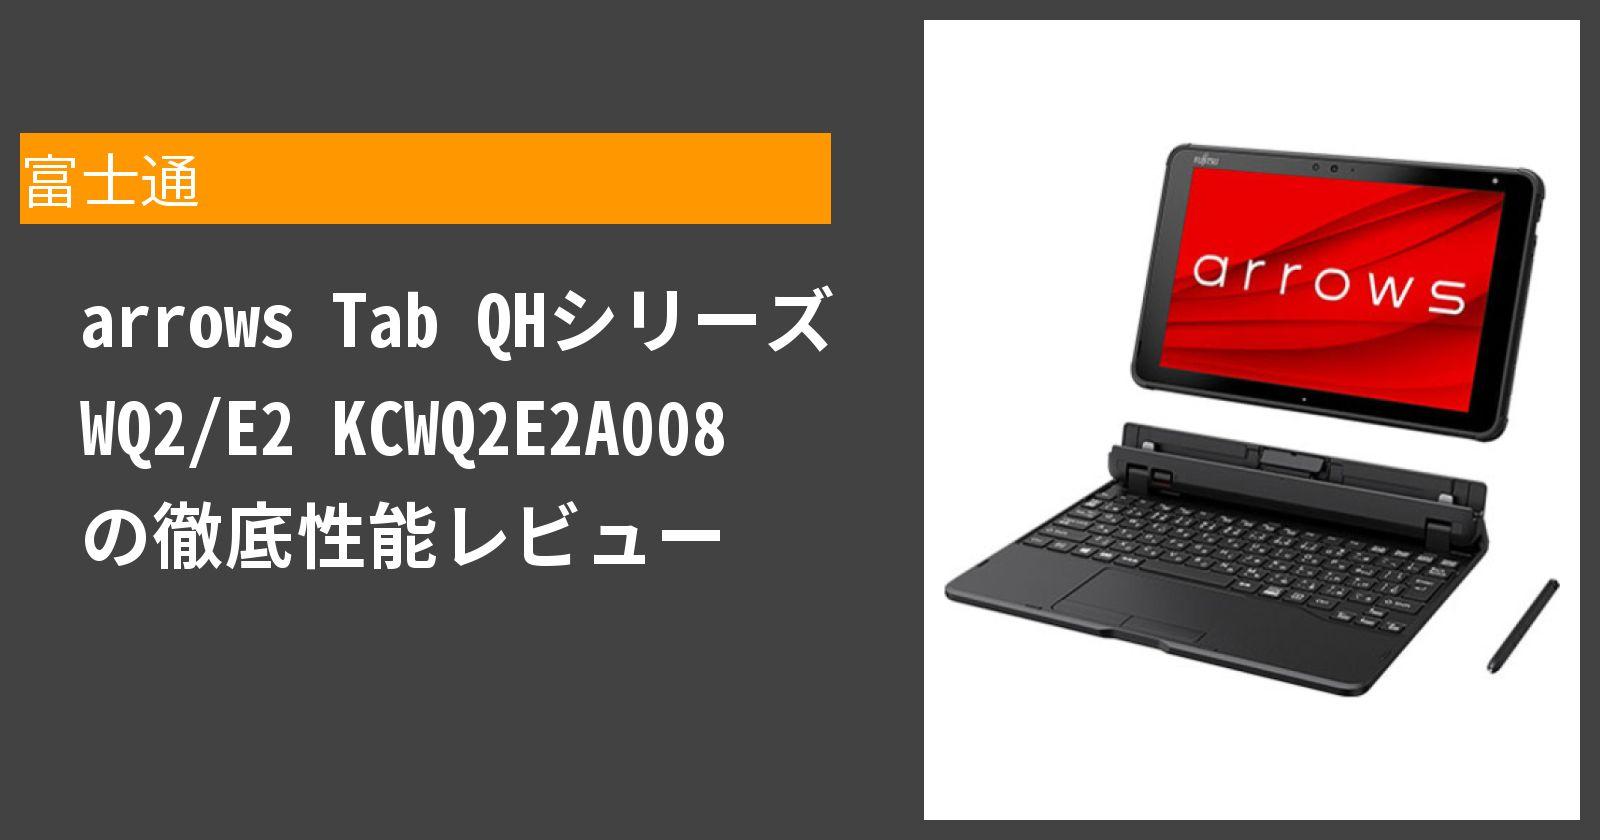 arrows Tab QHシリーズ WQ2/E2 KCWQ2E2A008 の徹底性能レビュー